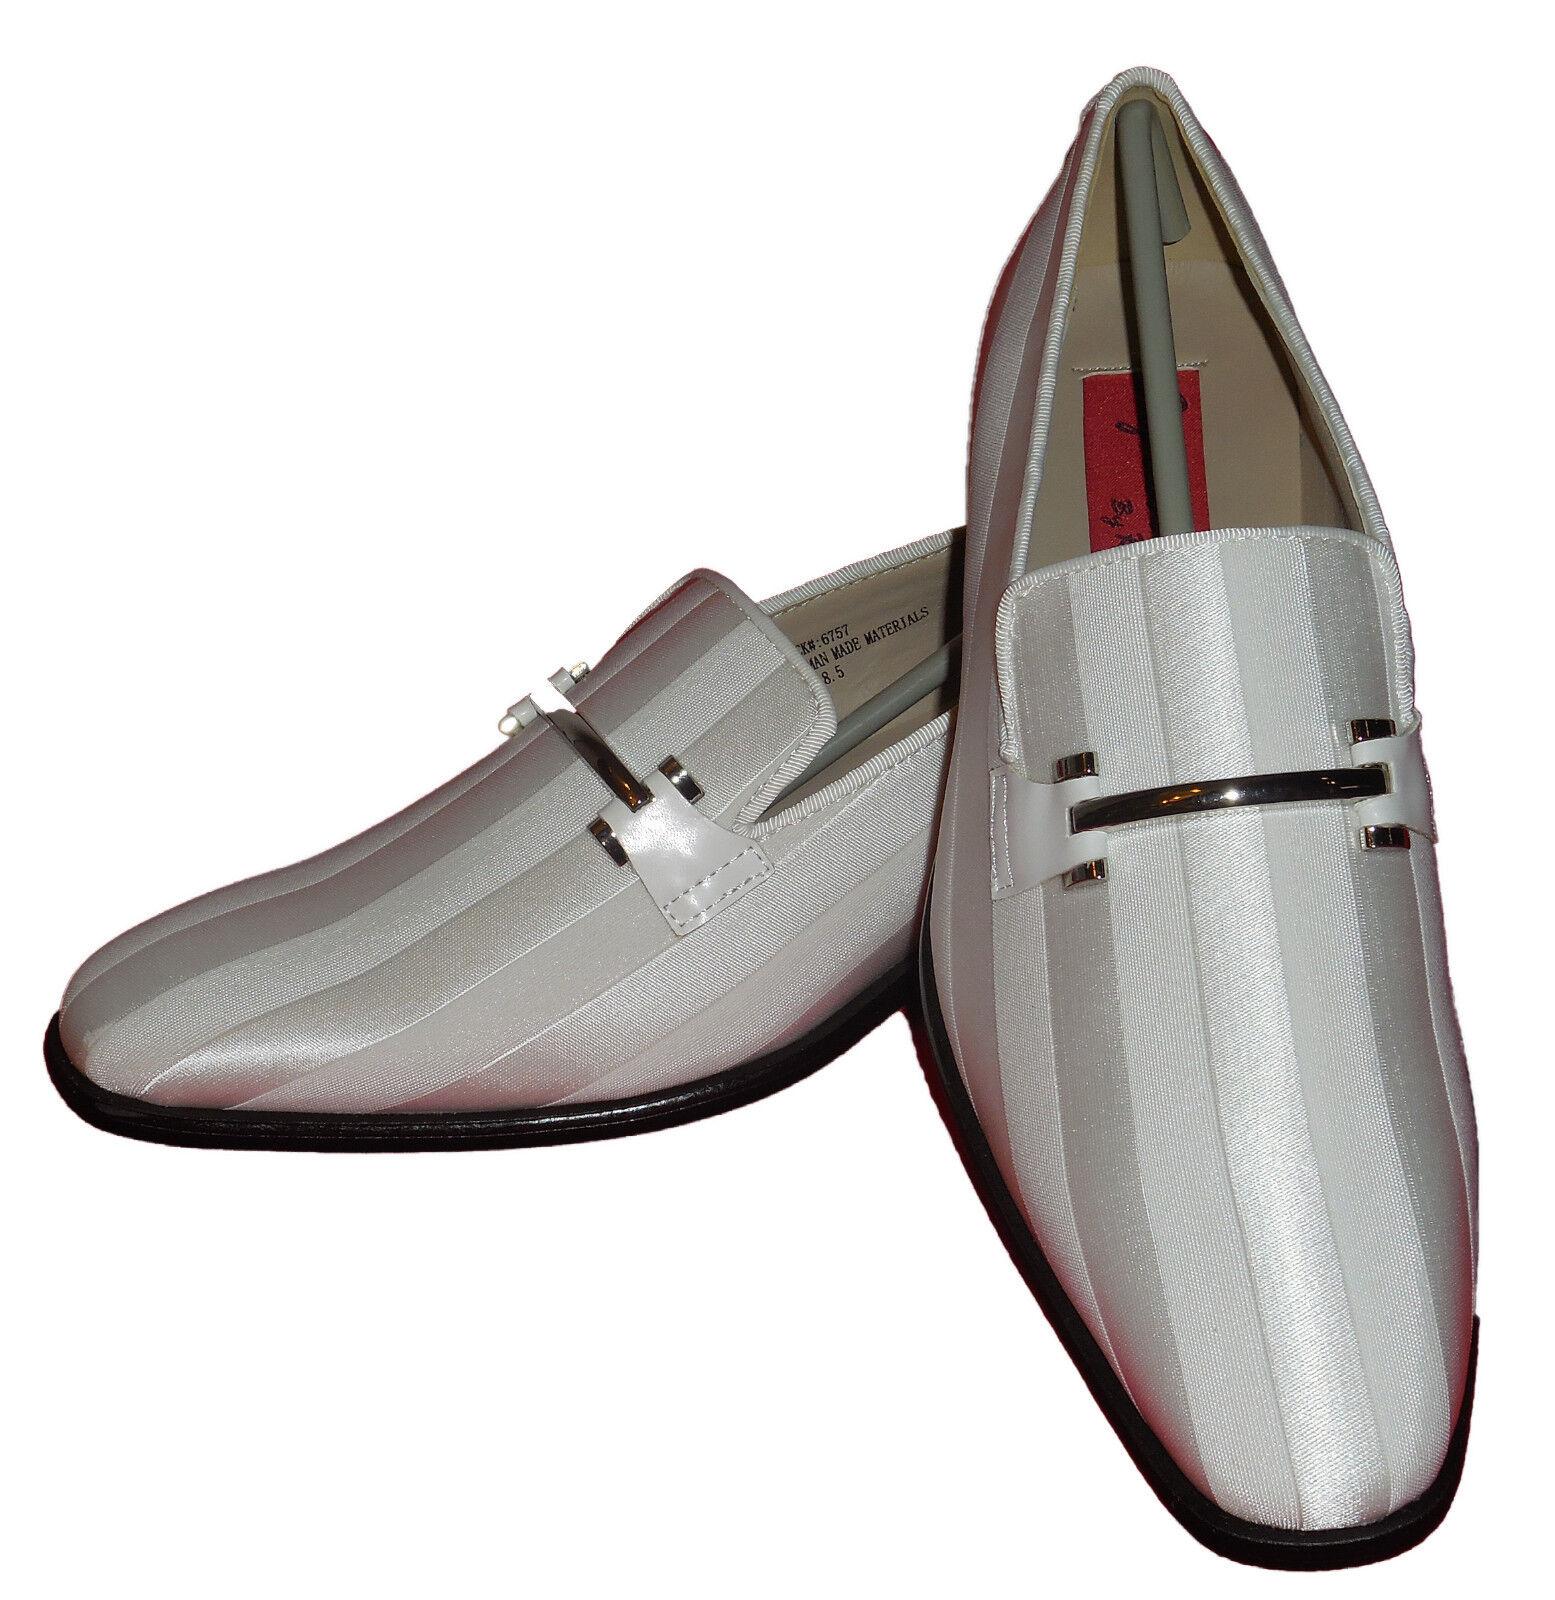 Expressions 6757 Mens Weiß Fancy Buckle Tuxedo Slip On Dress Loafers schuhe